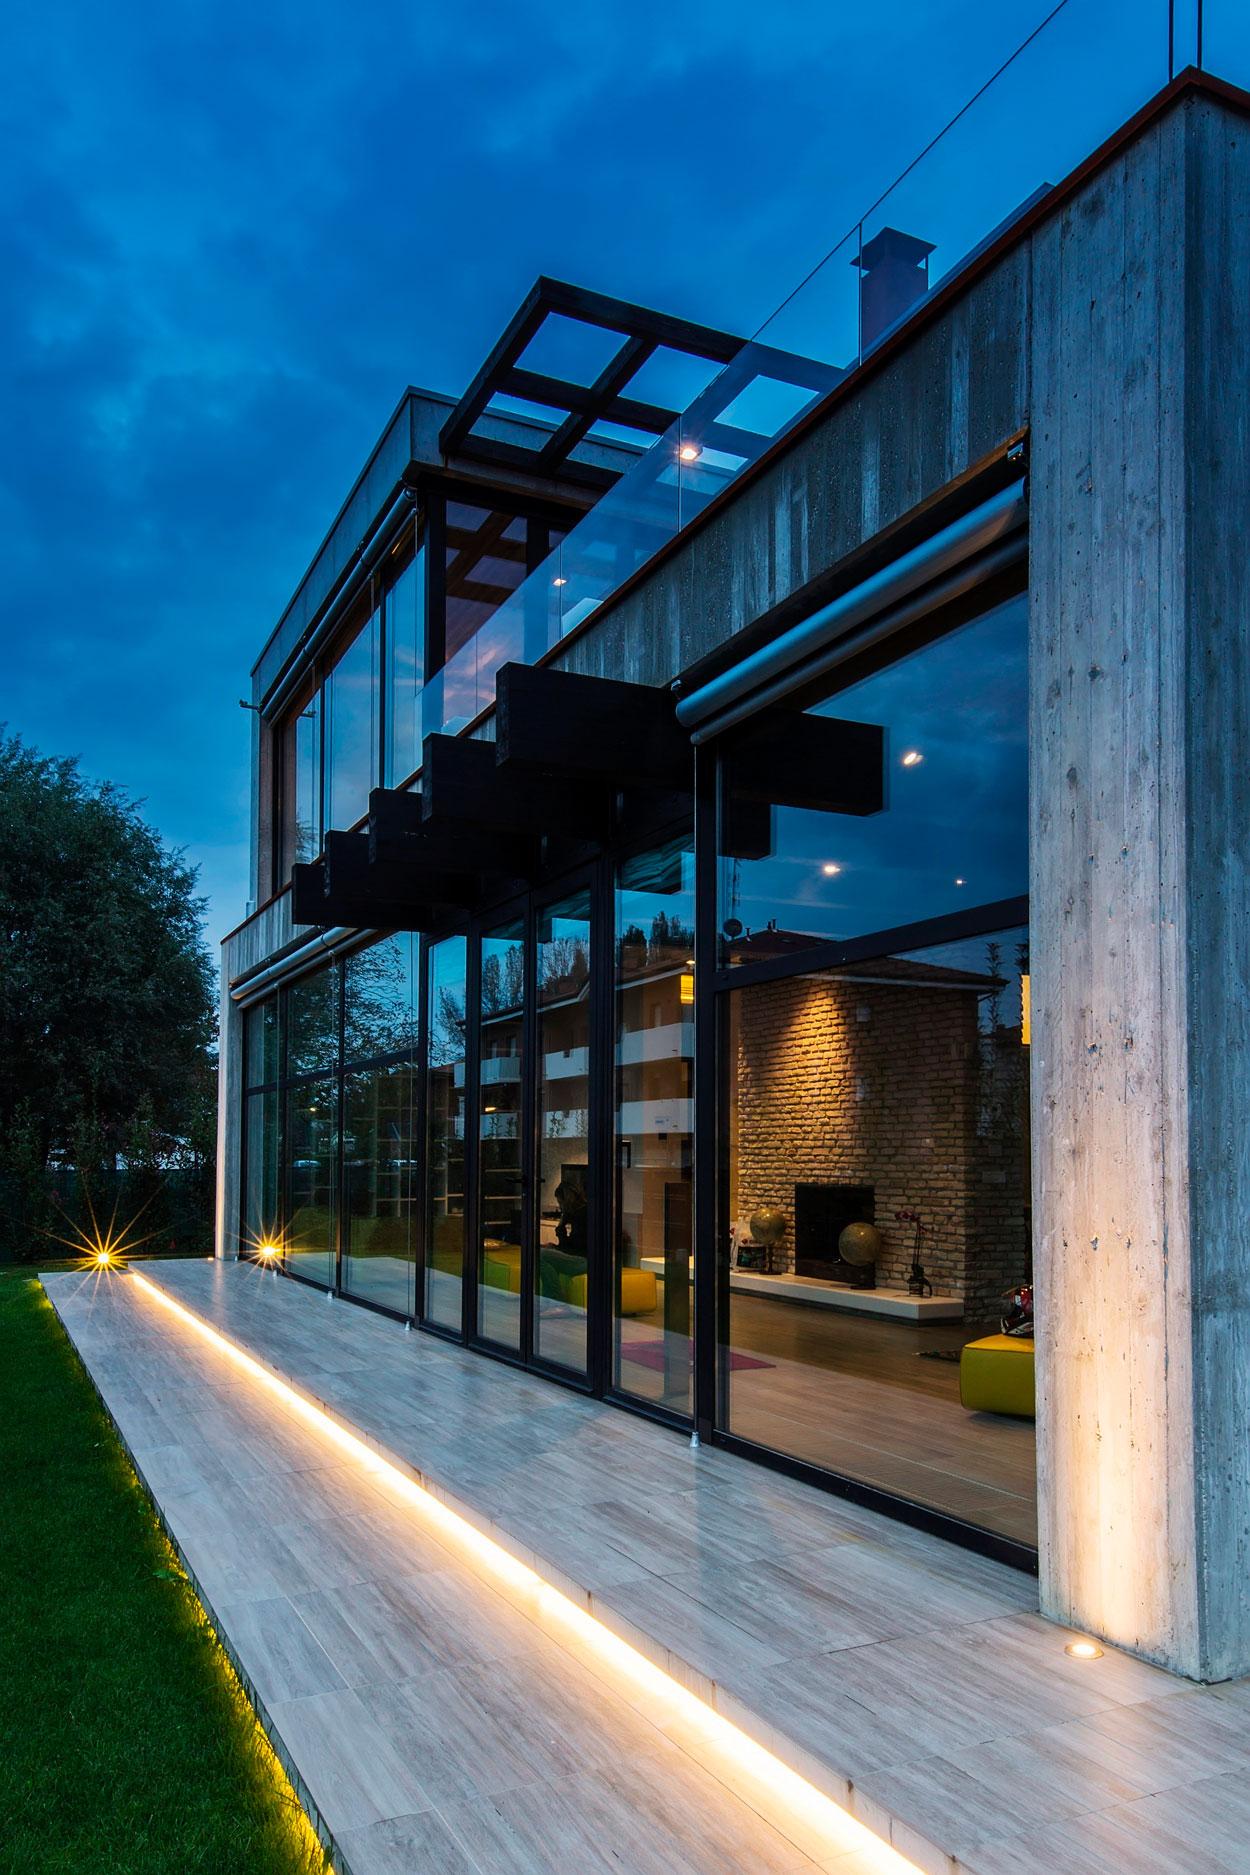 D'Autore Residence near Bologna by Giraldi Associati Architetti-46